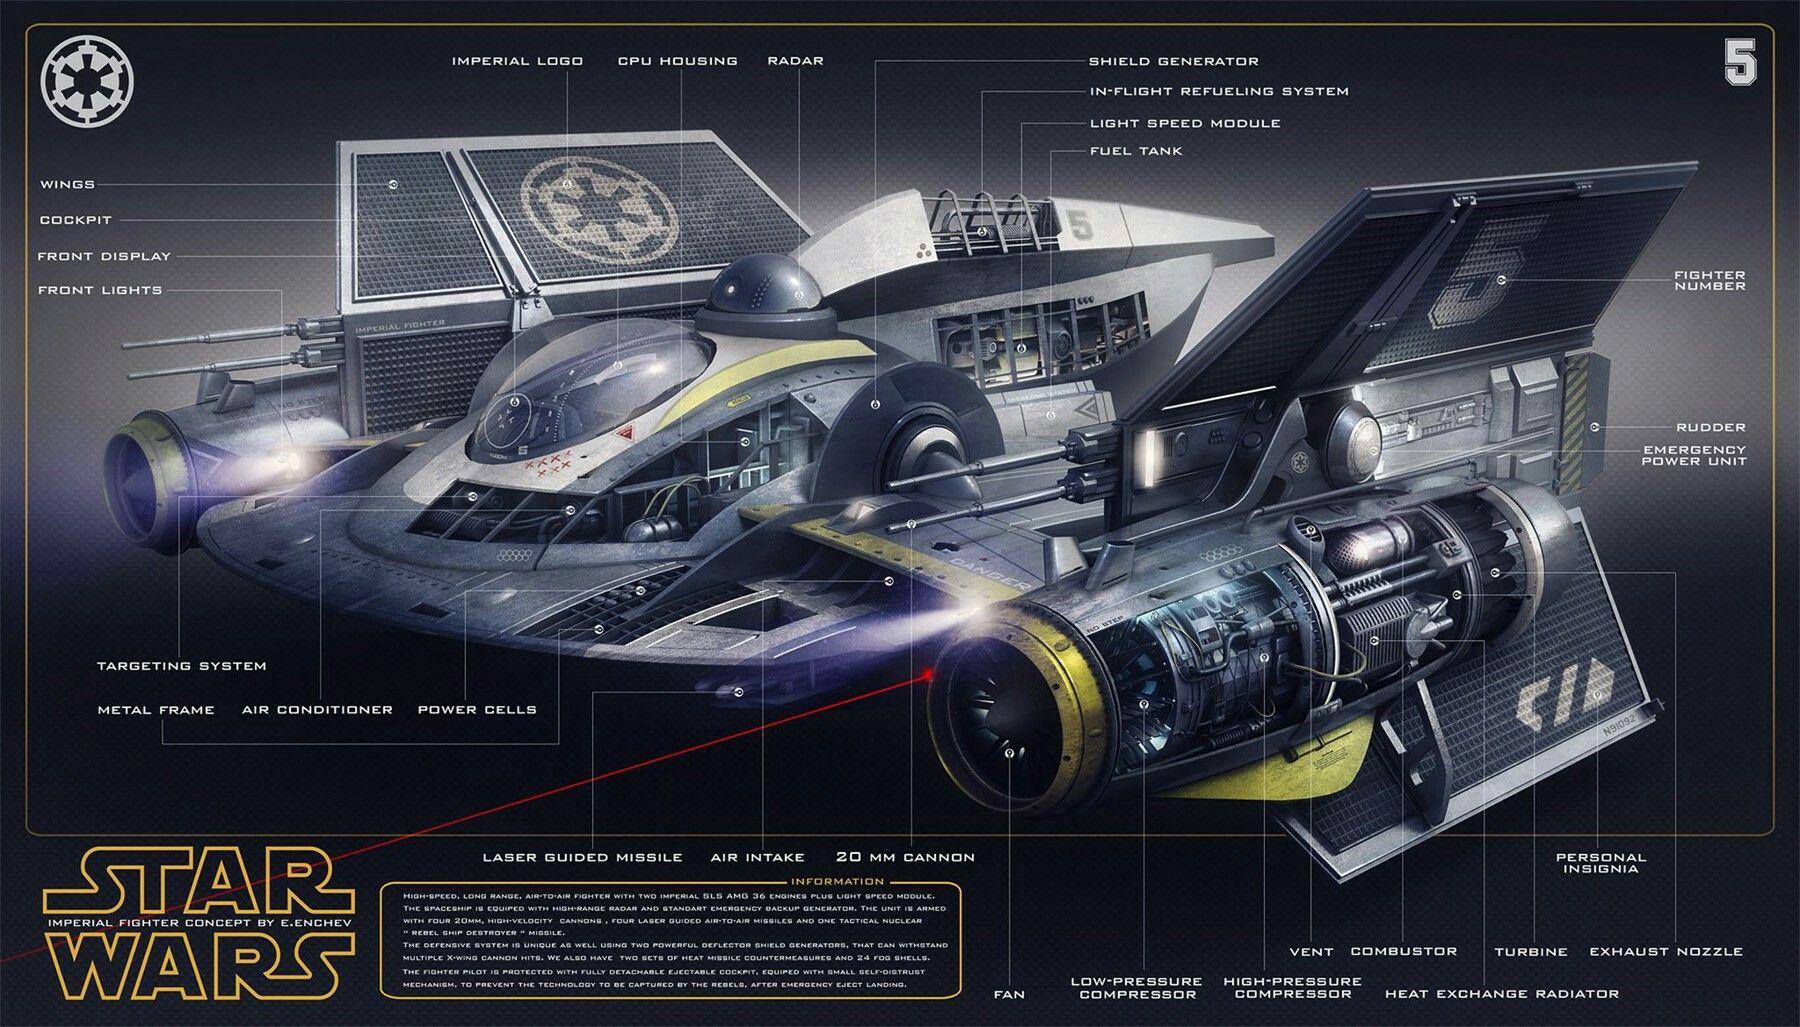 spaceship star wars spaceships pinterest spaceship star and sci fi. Black Bedroom Furniture Sets. Home Design Ideas